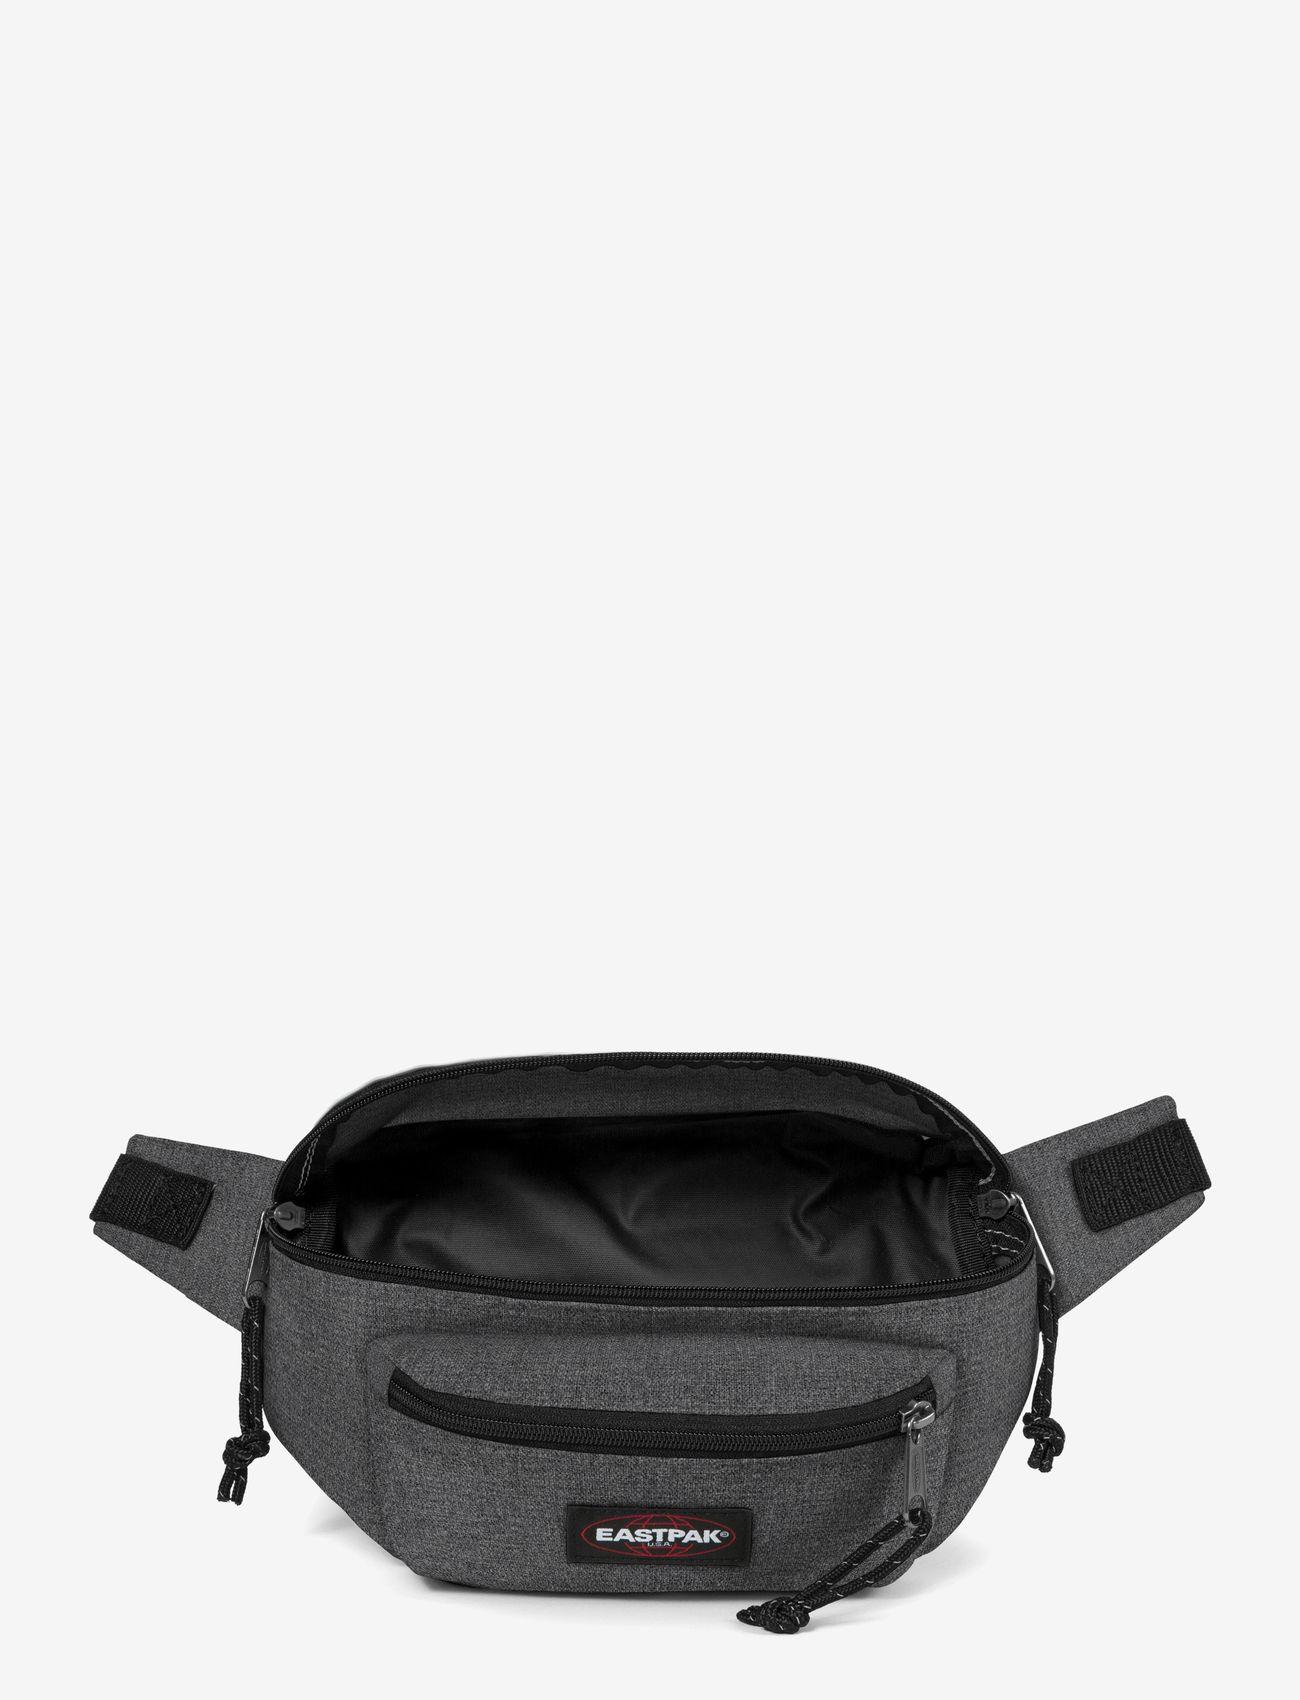 Eastpak - Doggy Bag - saszetka nerki - black denim - 1